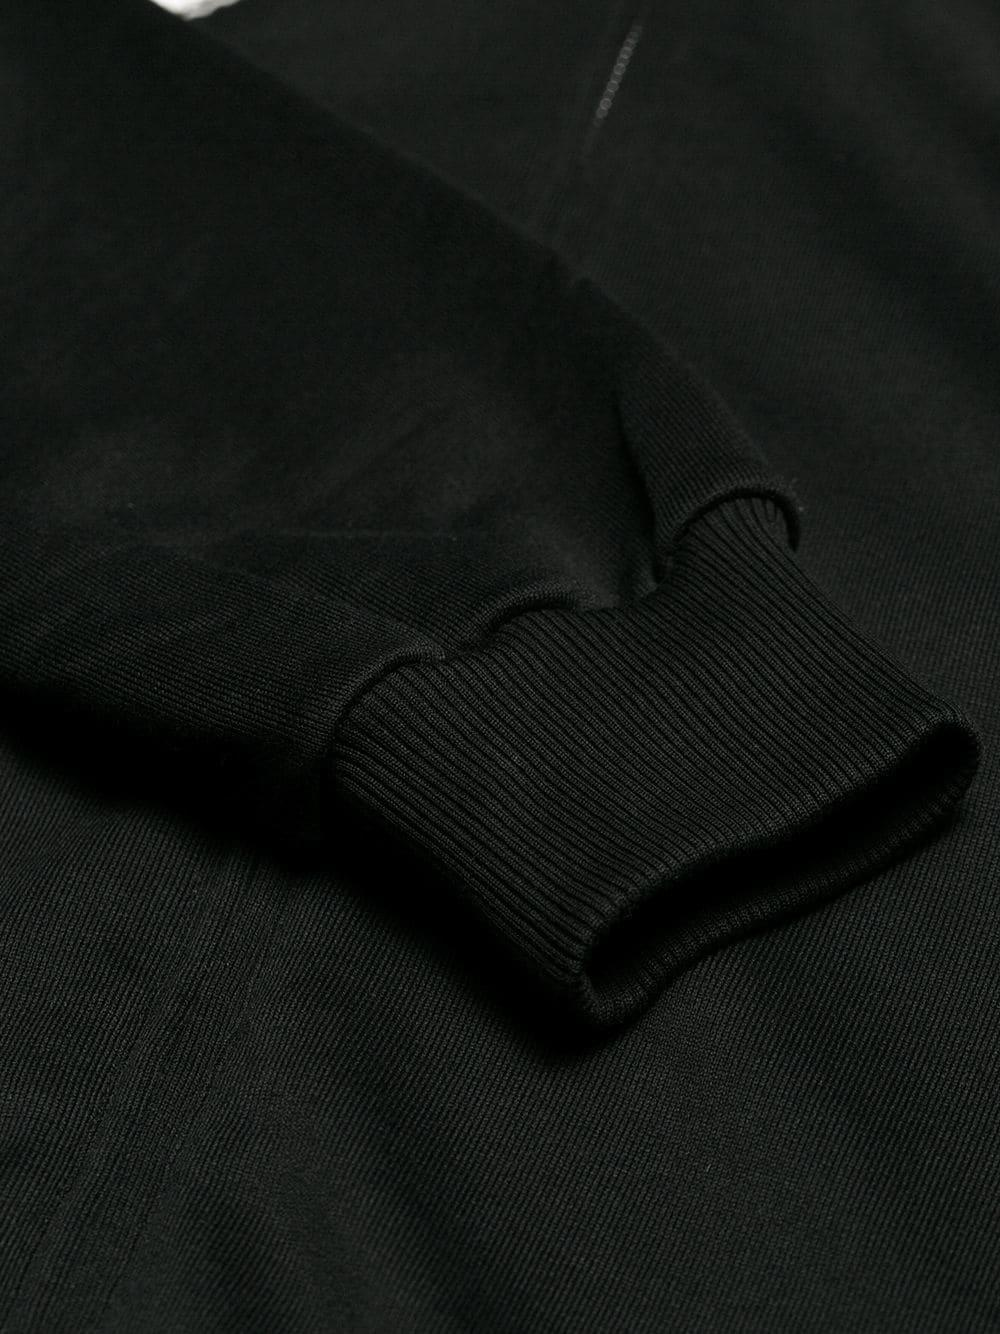 Dolce & Gabbana Silk Hooded Patch Jacket in Black for Men